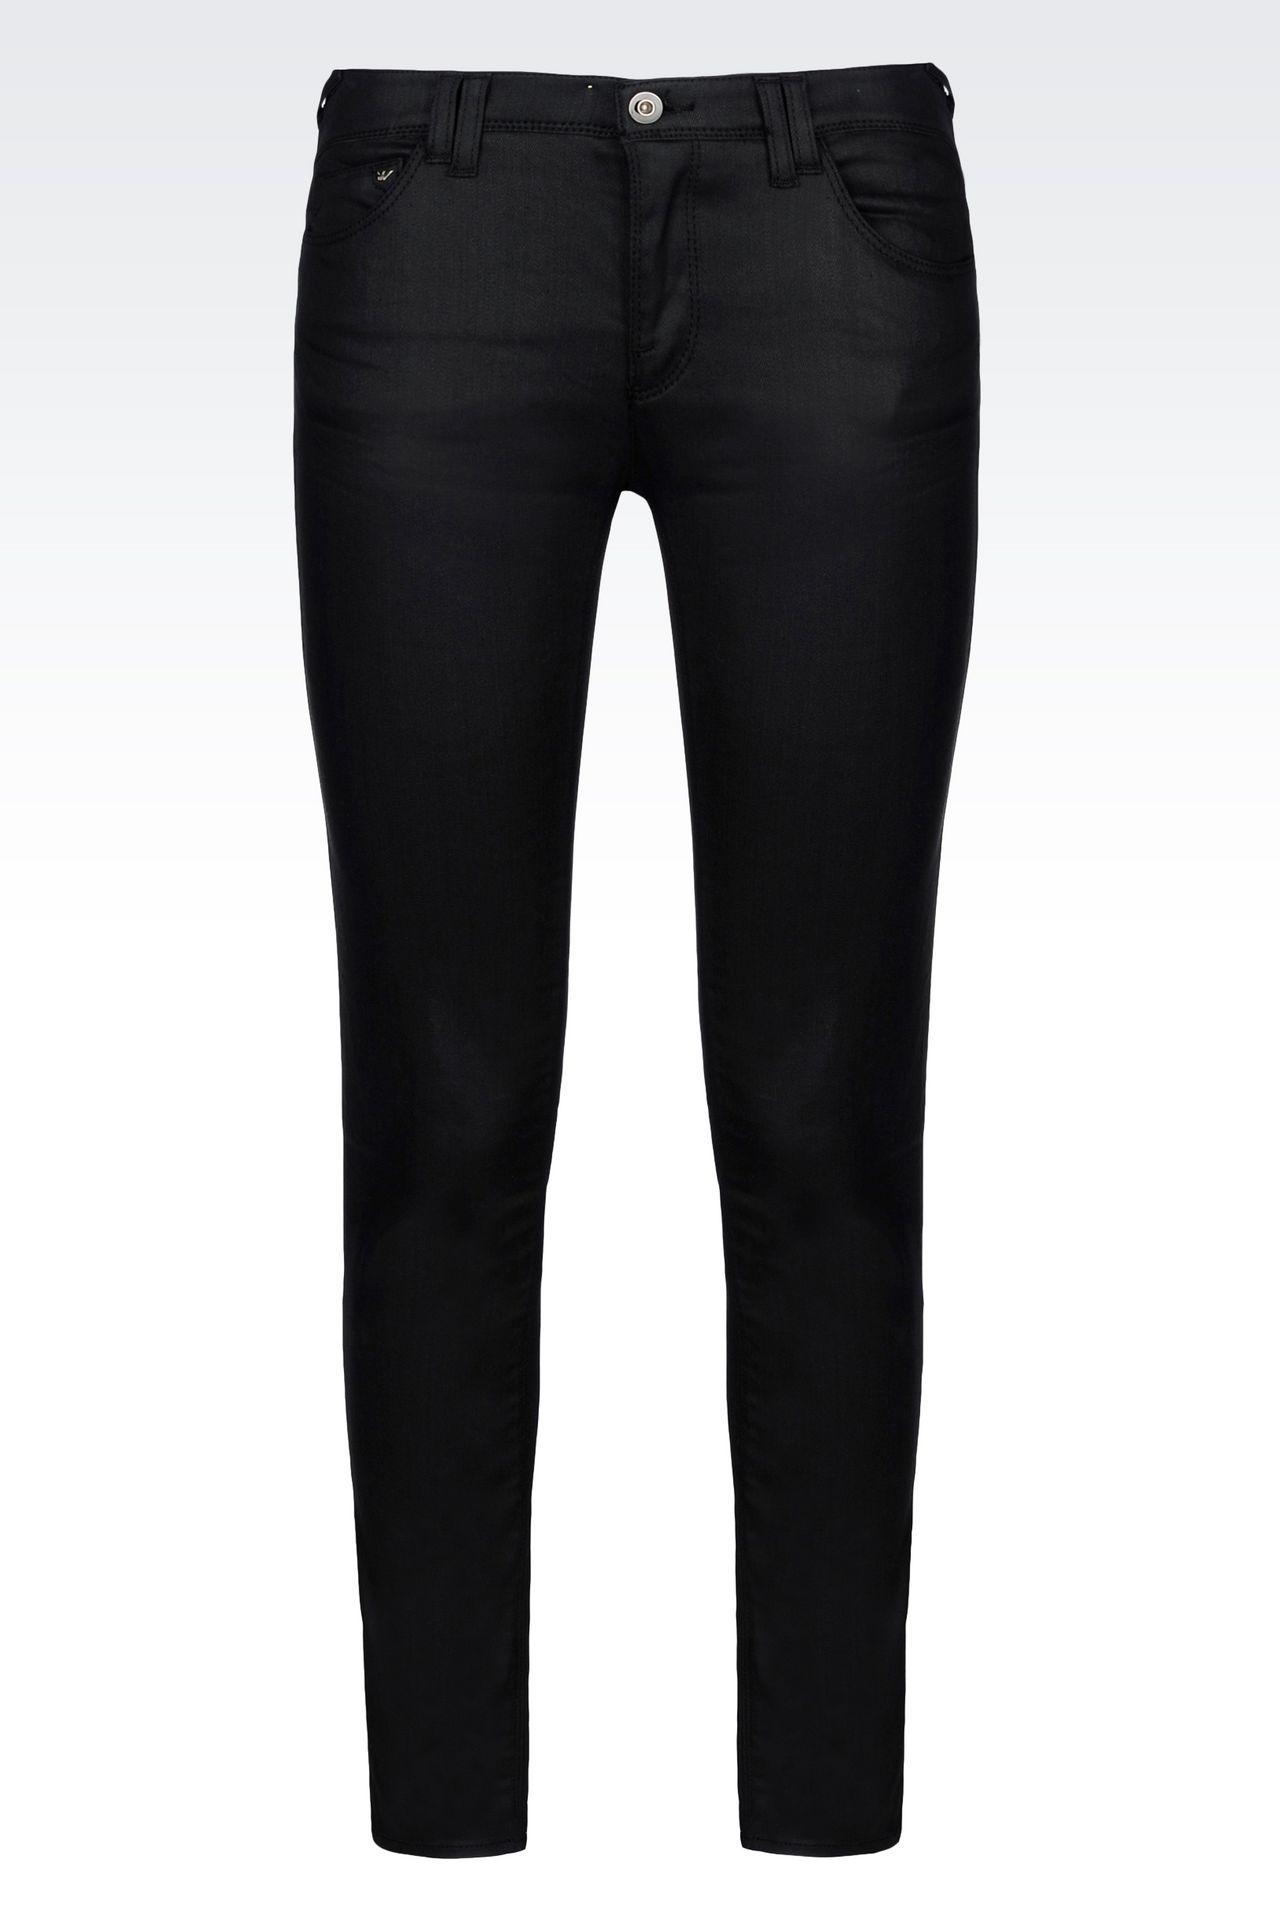 SKINNY JEANS IN LEATHER EFFECT DENIM: Jeans Women by Armani - 0